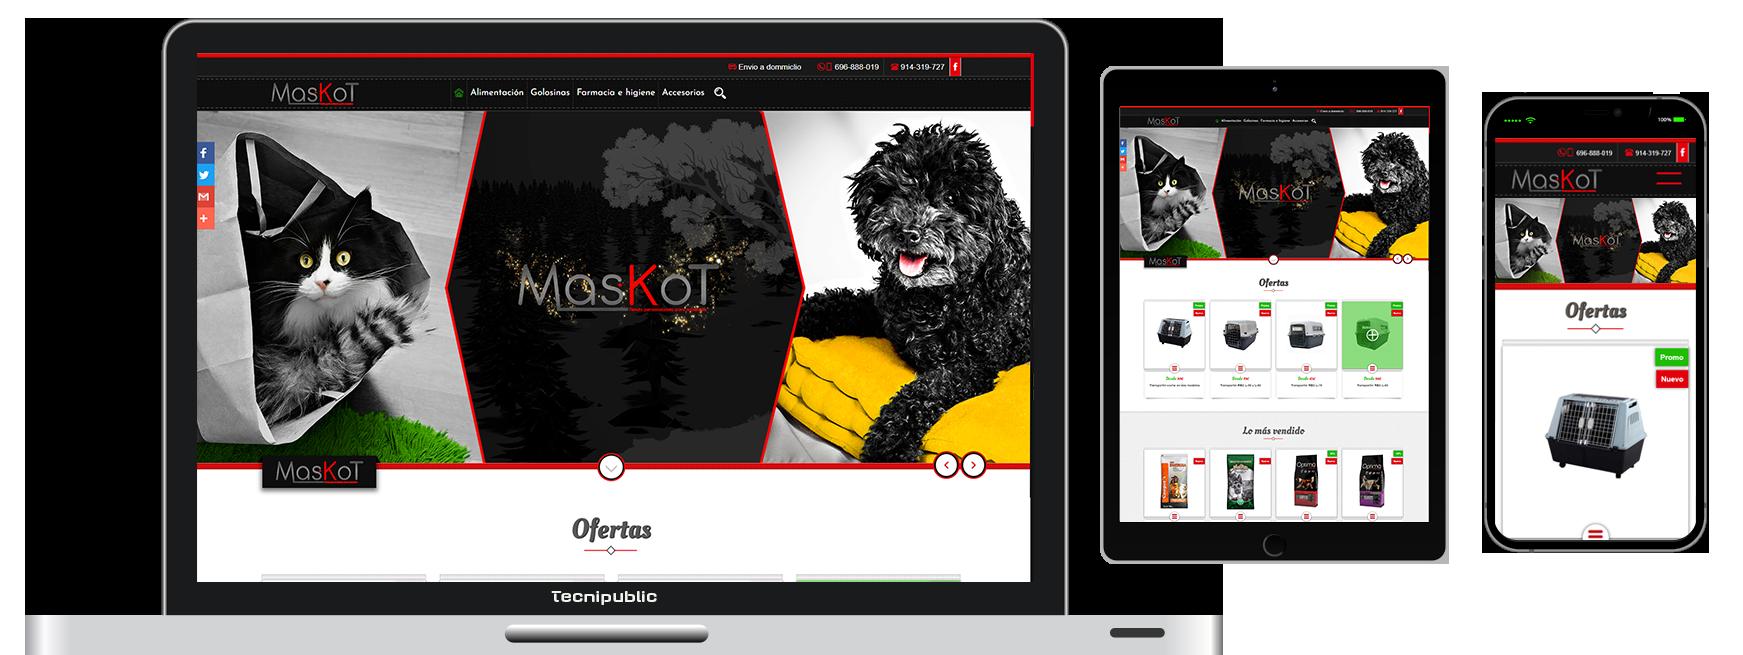 Web diseño fluido para Maskot - 2017